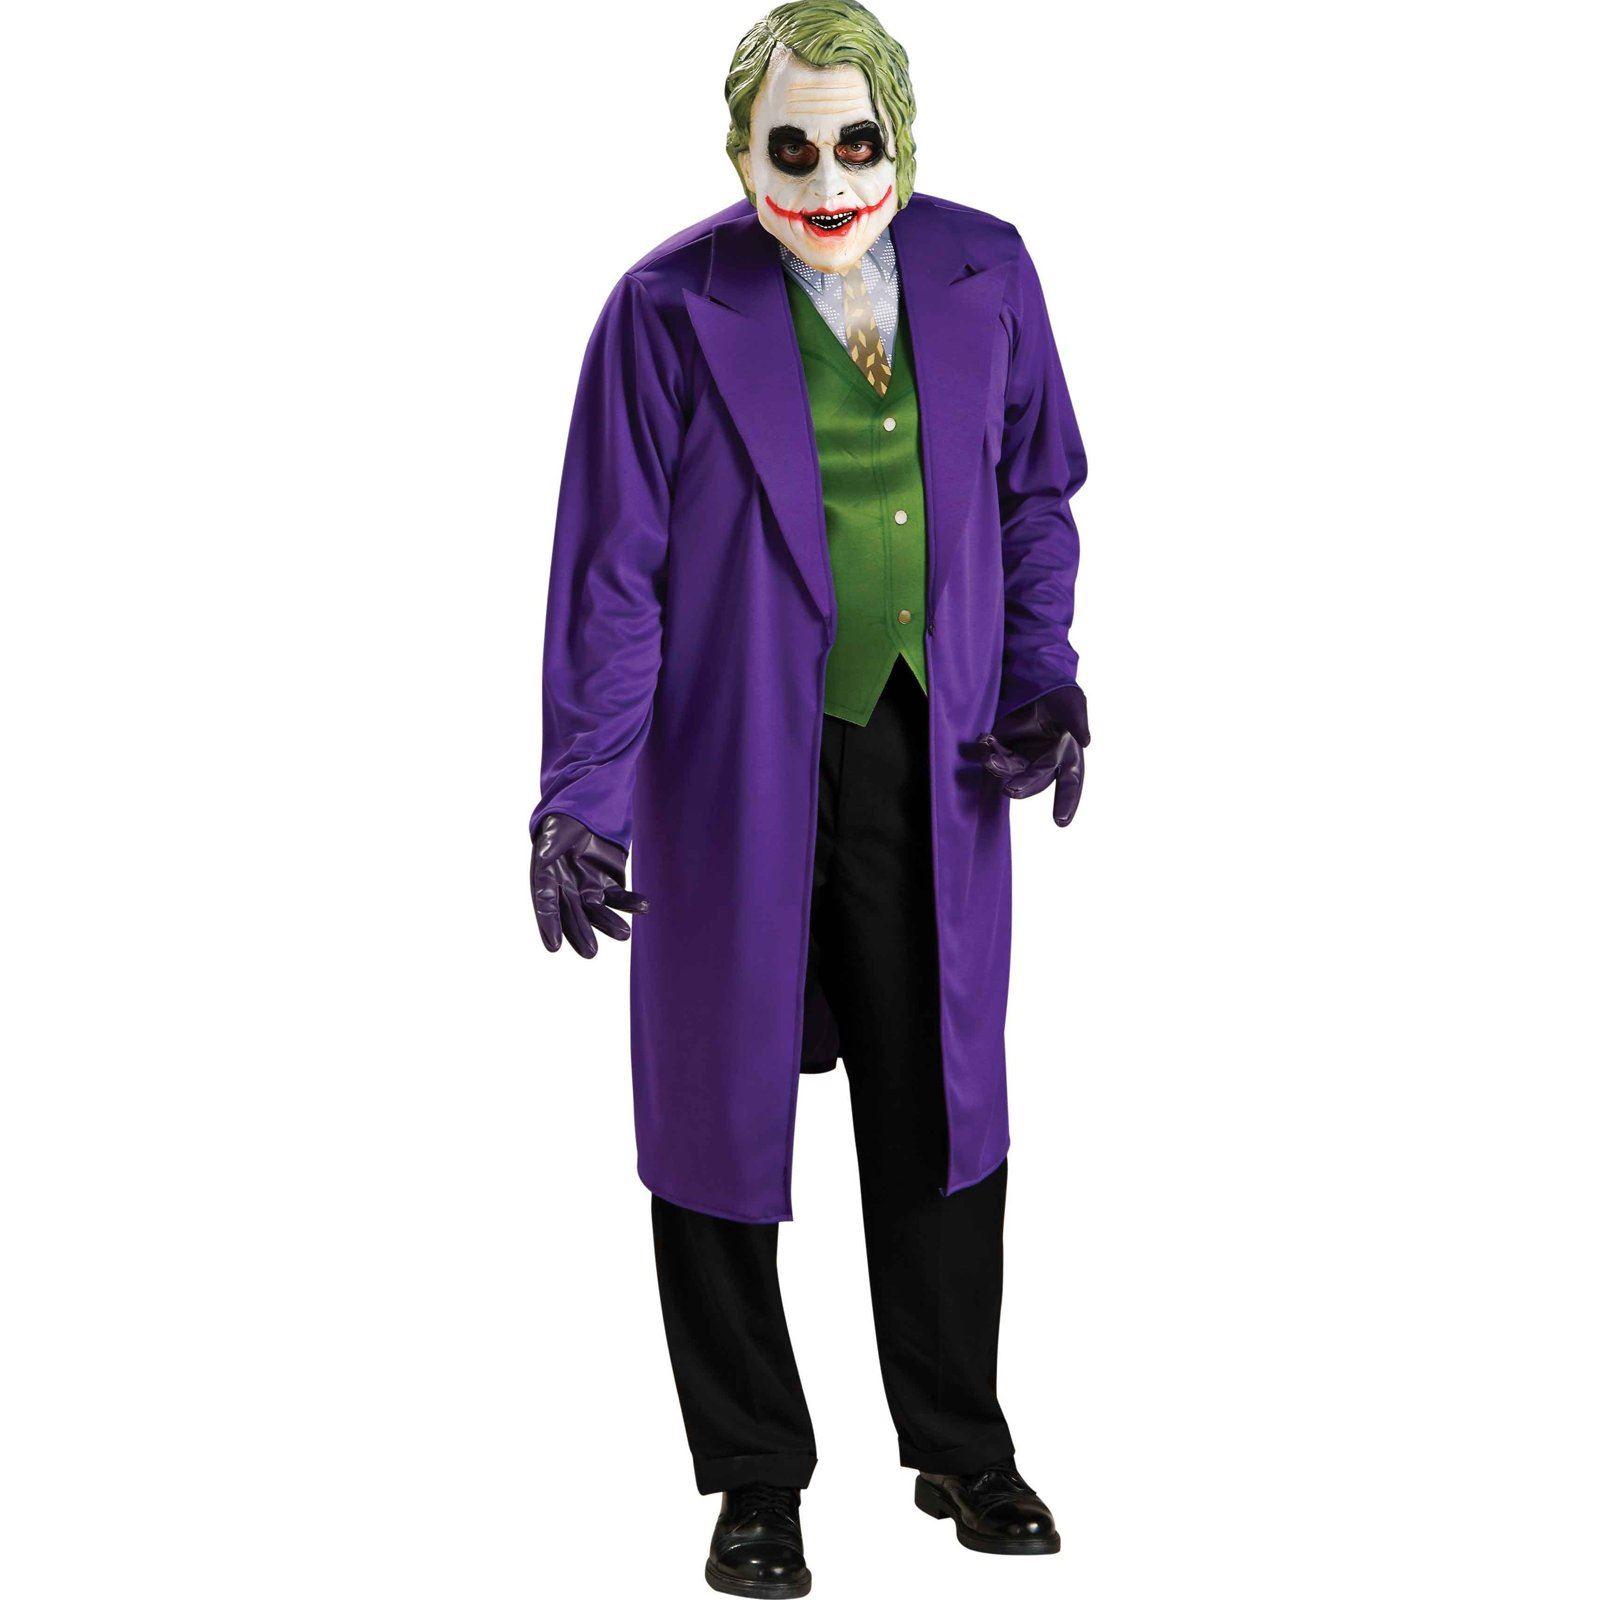 Adult Batman Dark Knight The Joker Men Costume  sc 1 st  The Costume Land & Adult Batman Dark Knight The Joker Men Costume | $50.99 | The ...